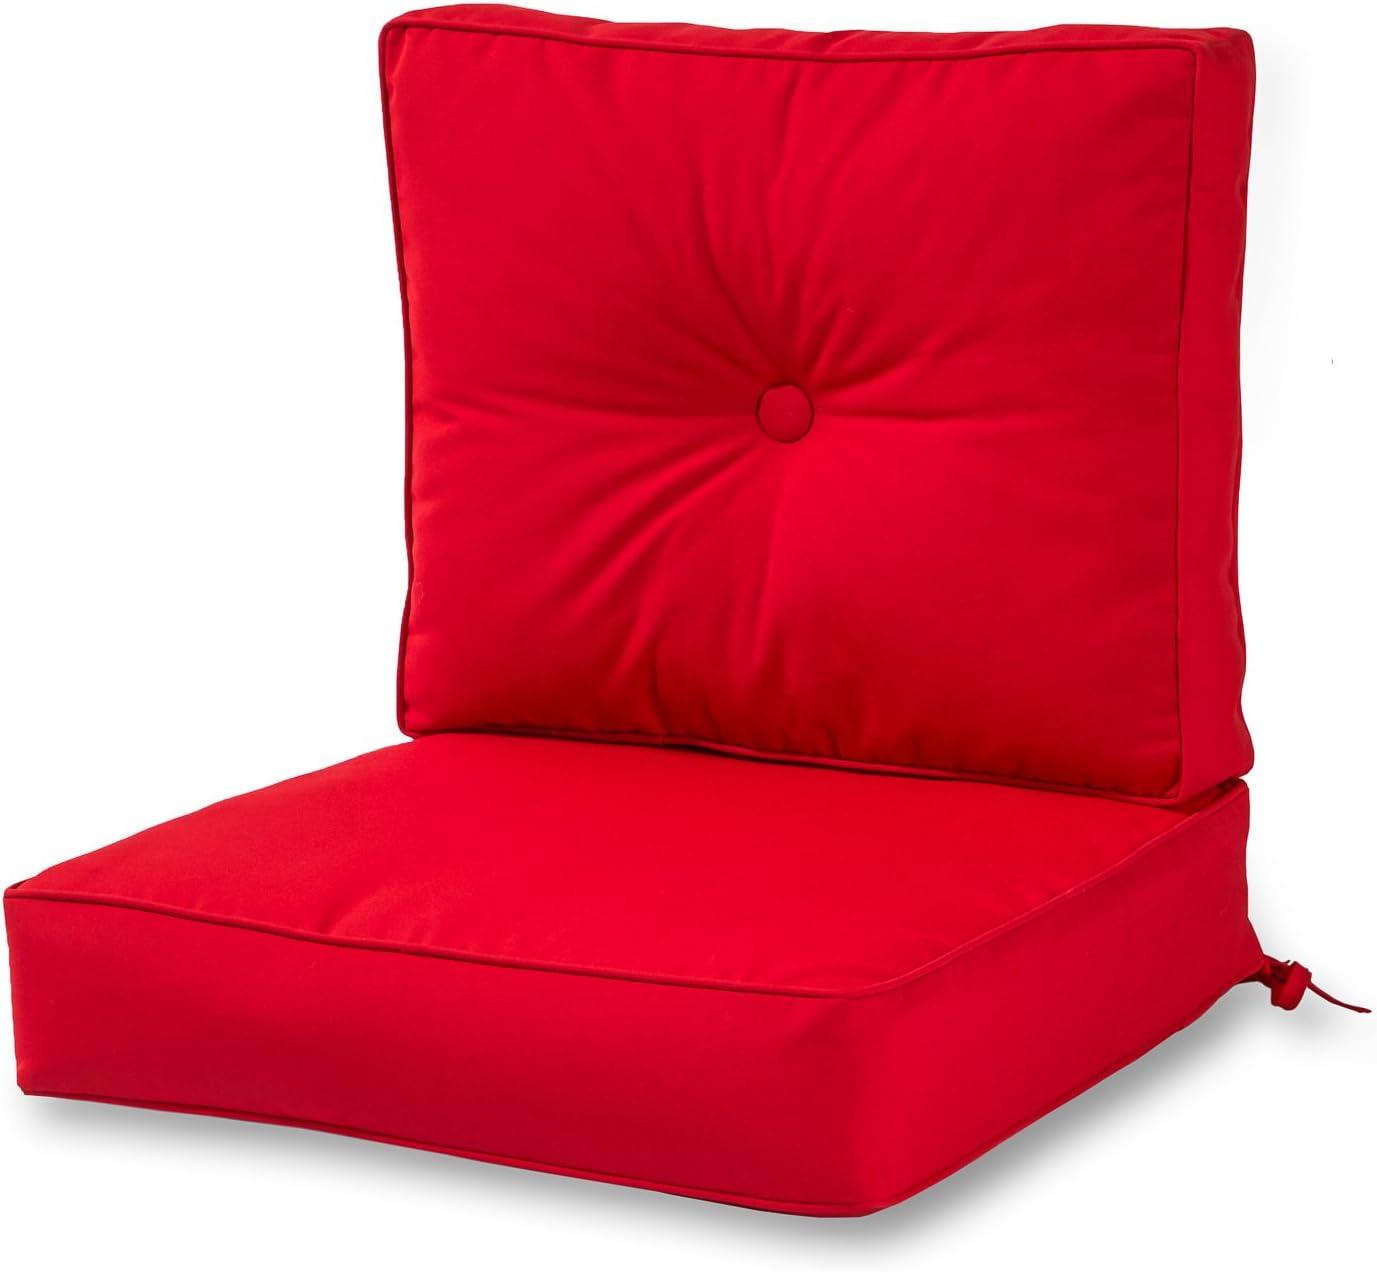 Greendale Home Fashions AZSC7830-JOCKEYRED Ruby Outdoor 2-Piece Sunbrella Fabric Deep Seat Cushion Set